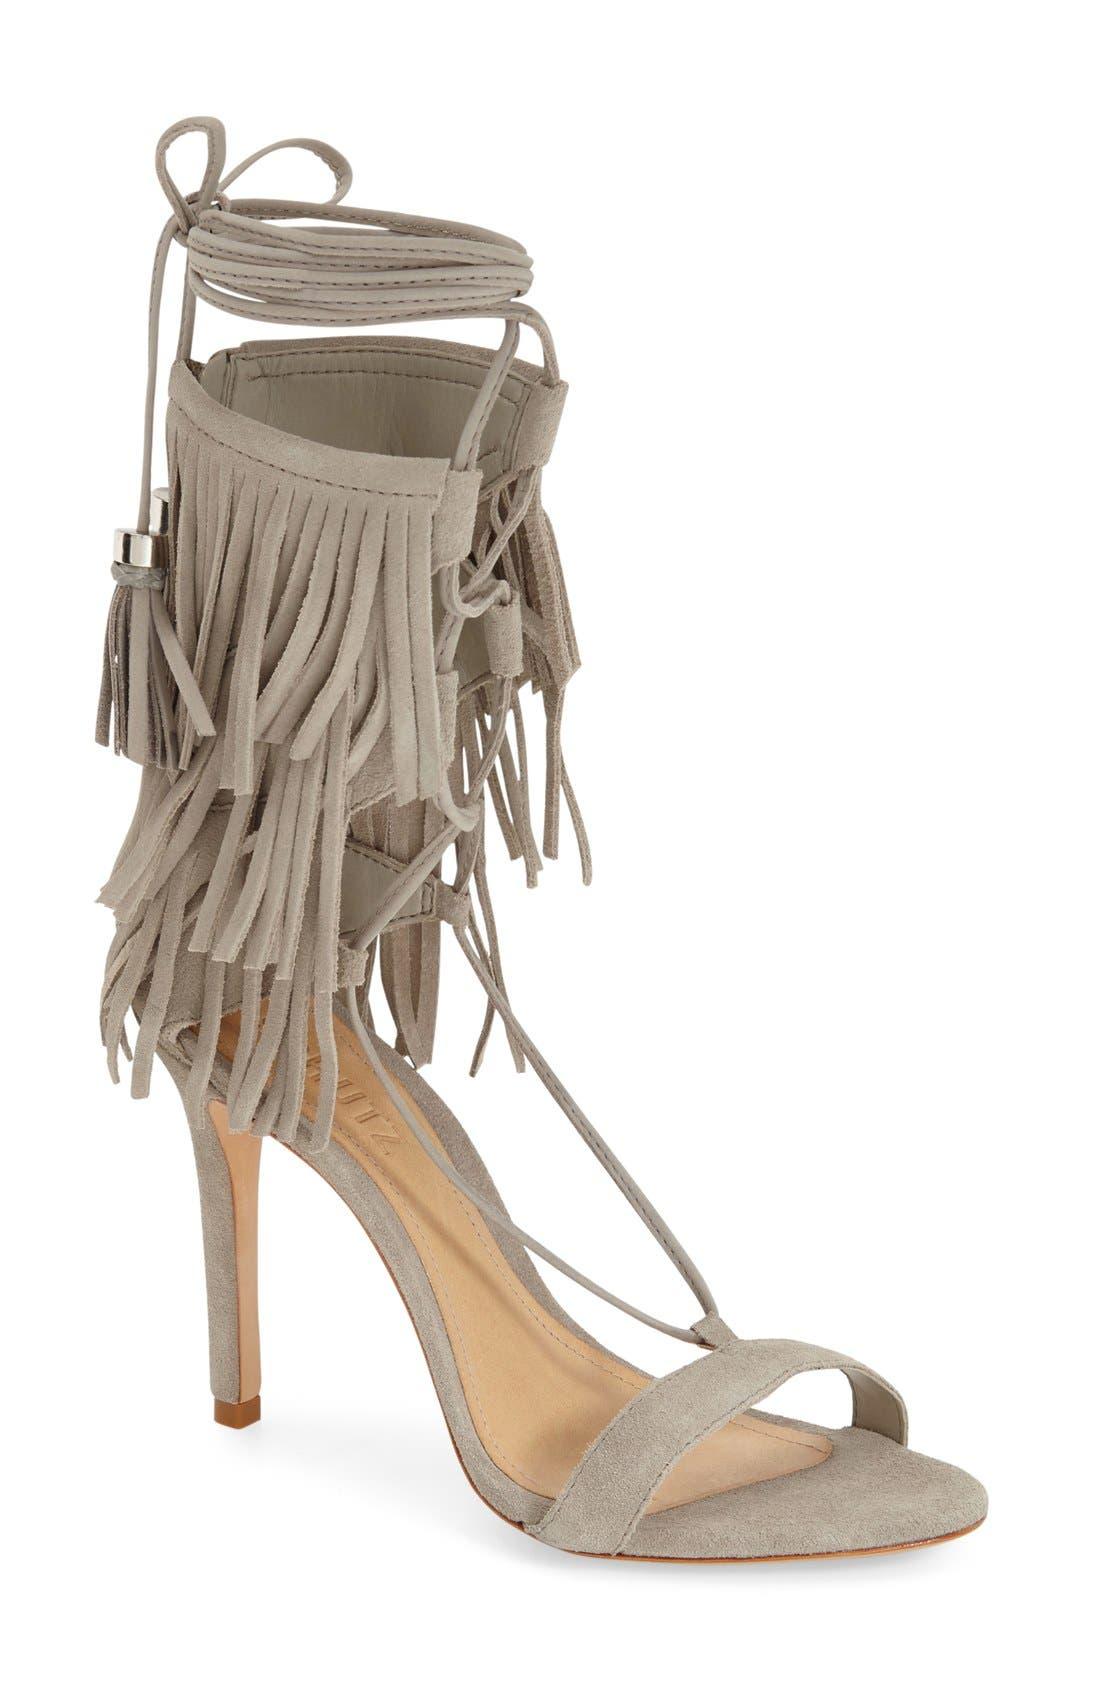 Main Image - Schutz 'Kija' Sandal (Women)